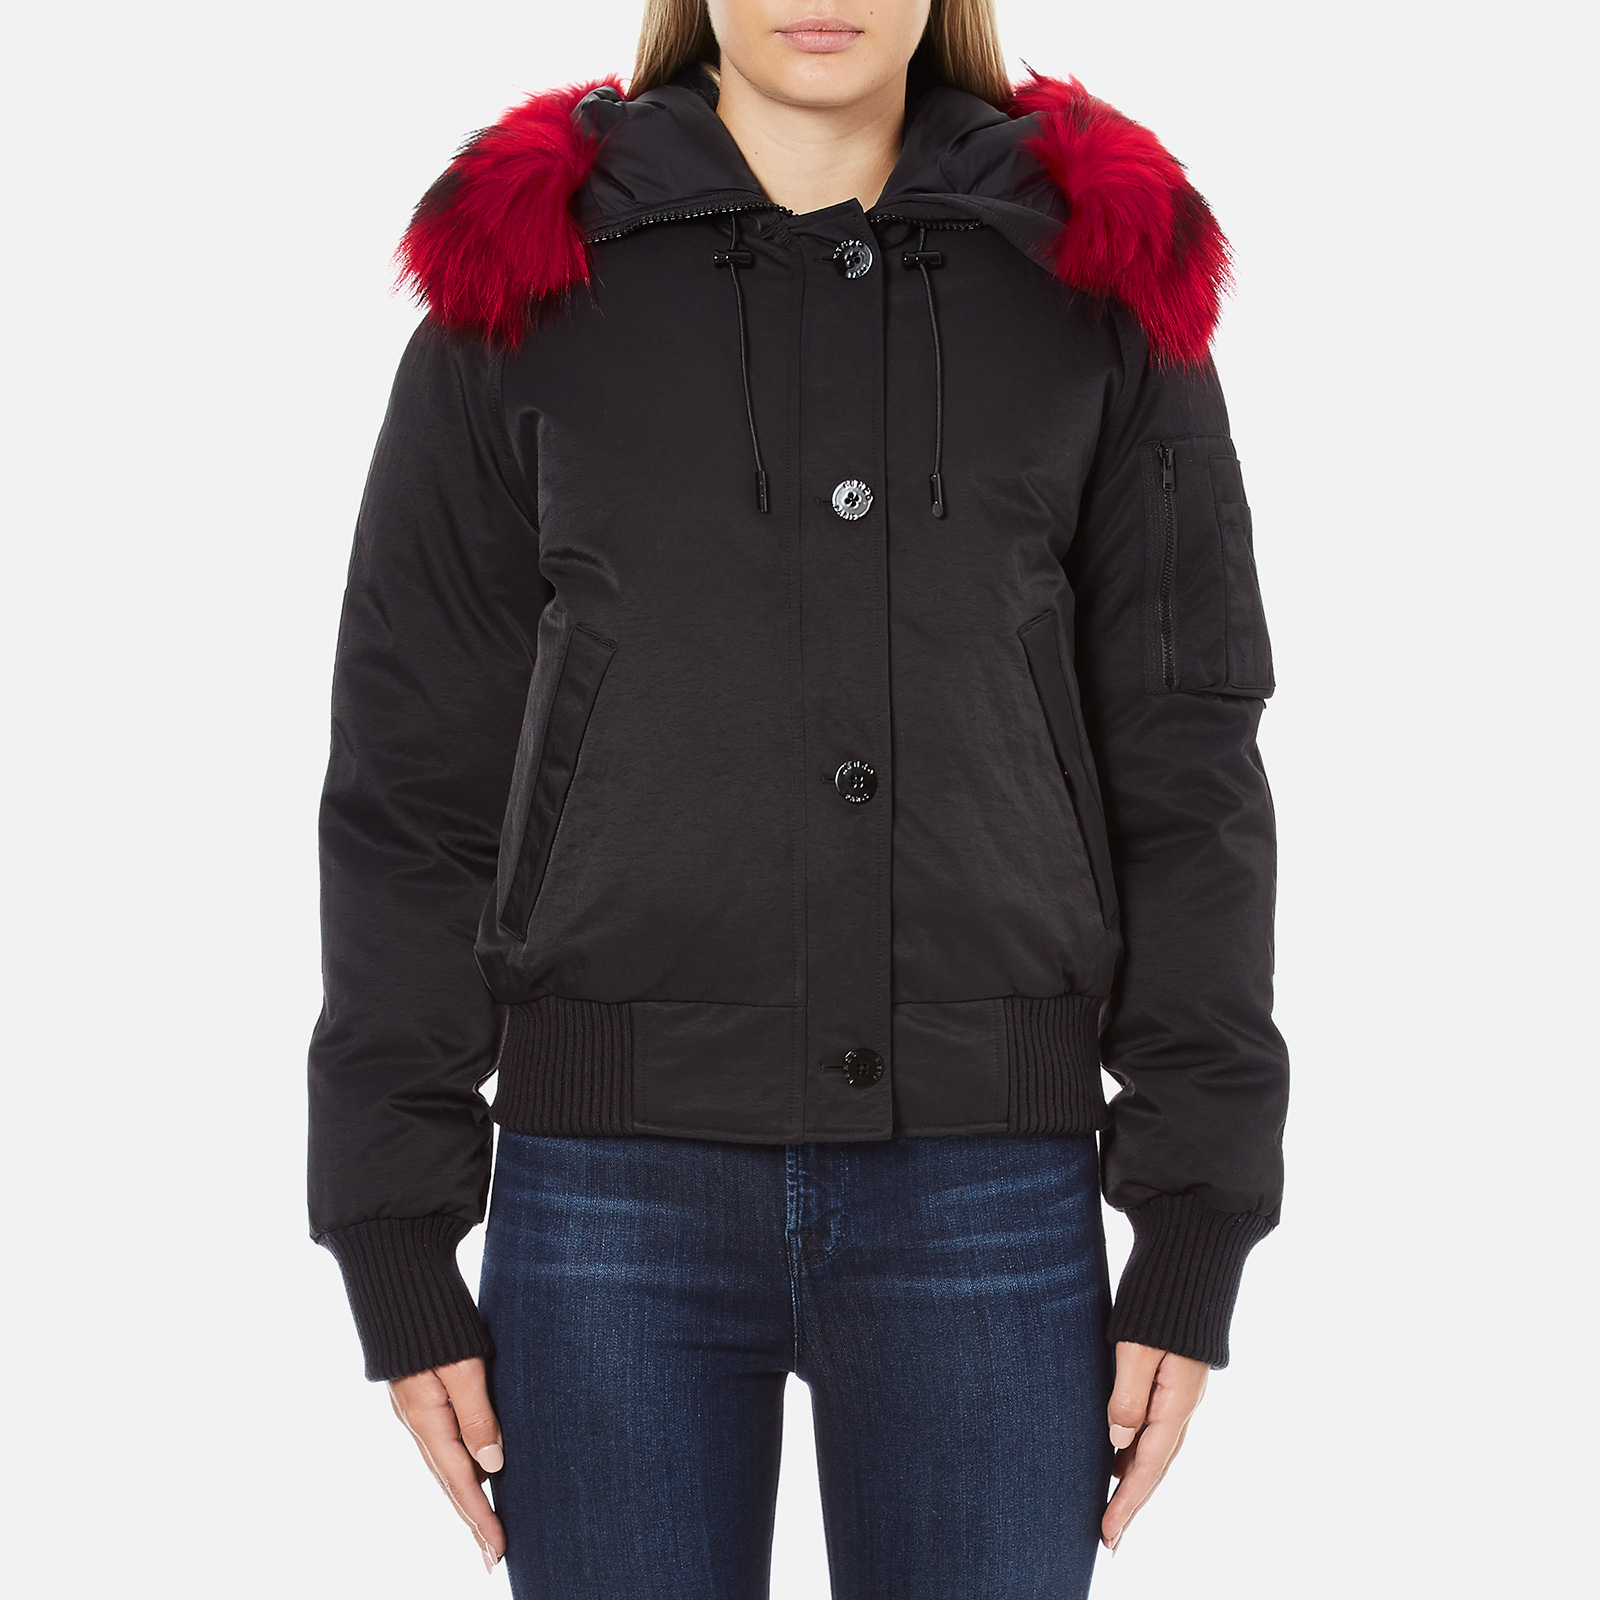 ba5c25c3 KENZO Women's Removable Red Fur Lined Short Parka - Black